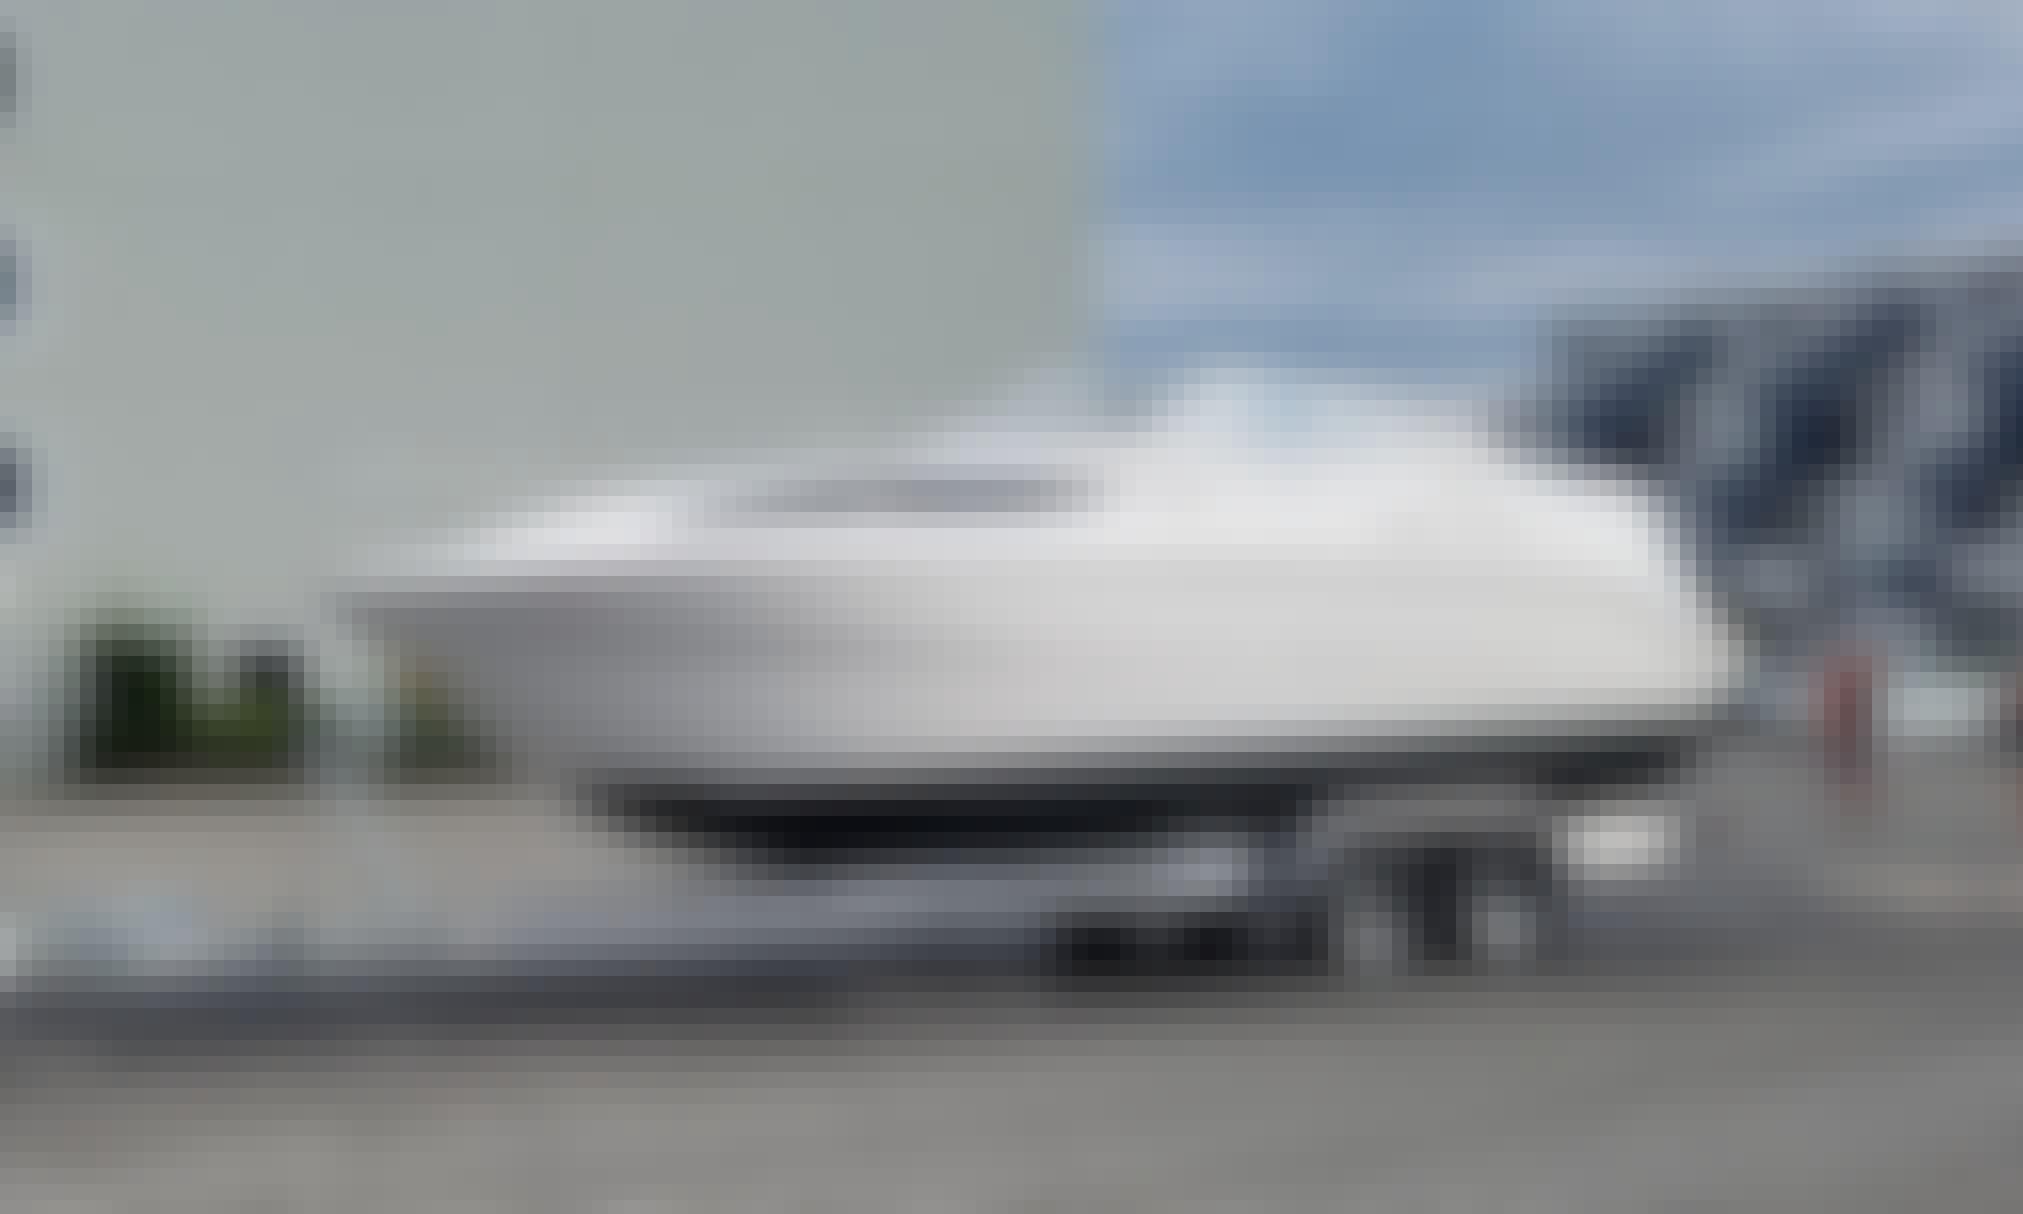 24' Bayliner Cabin Cruiser on the St Louis River